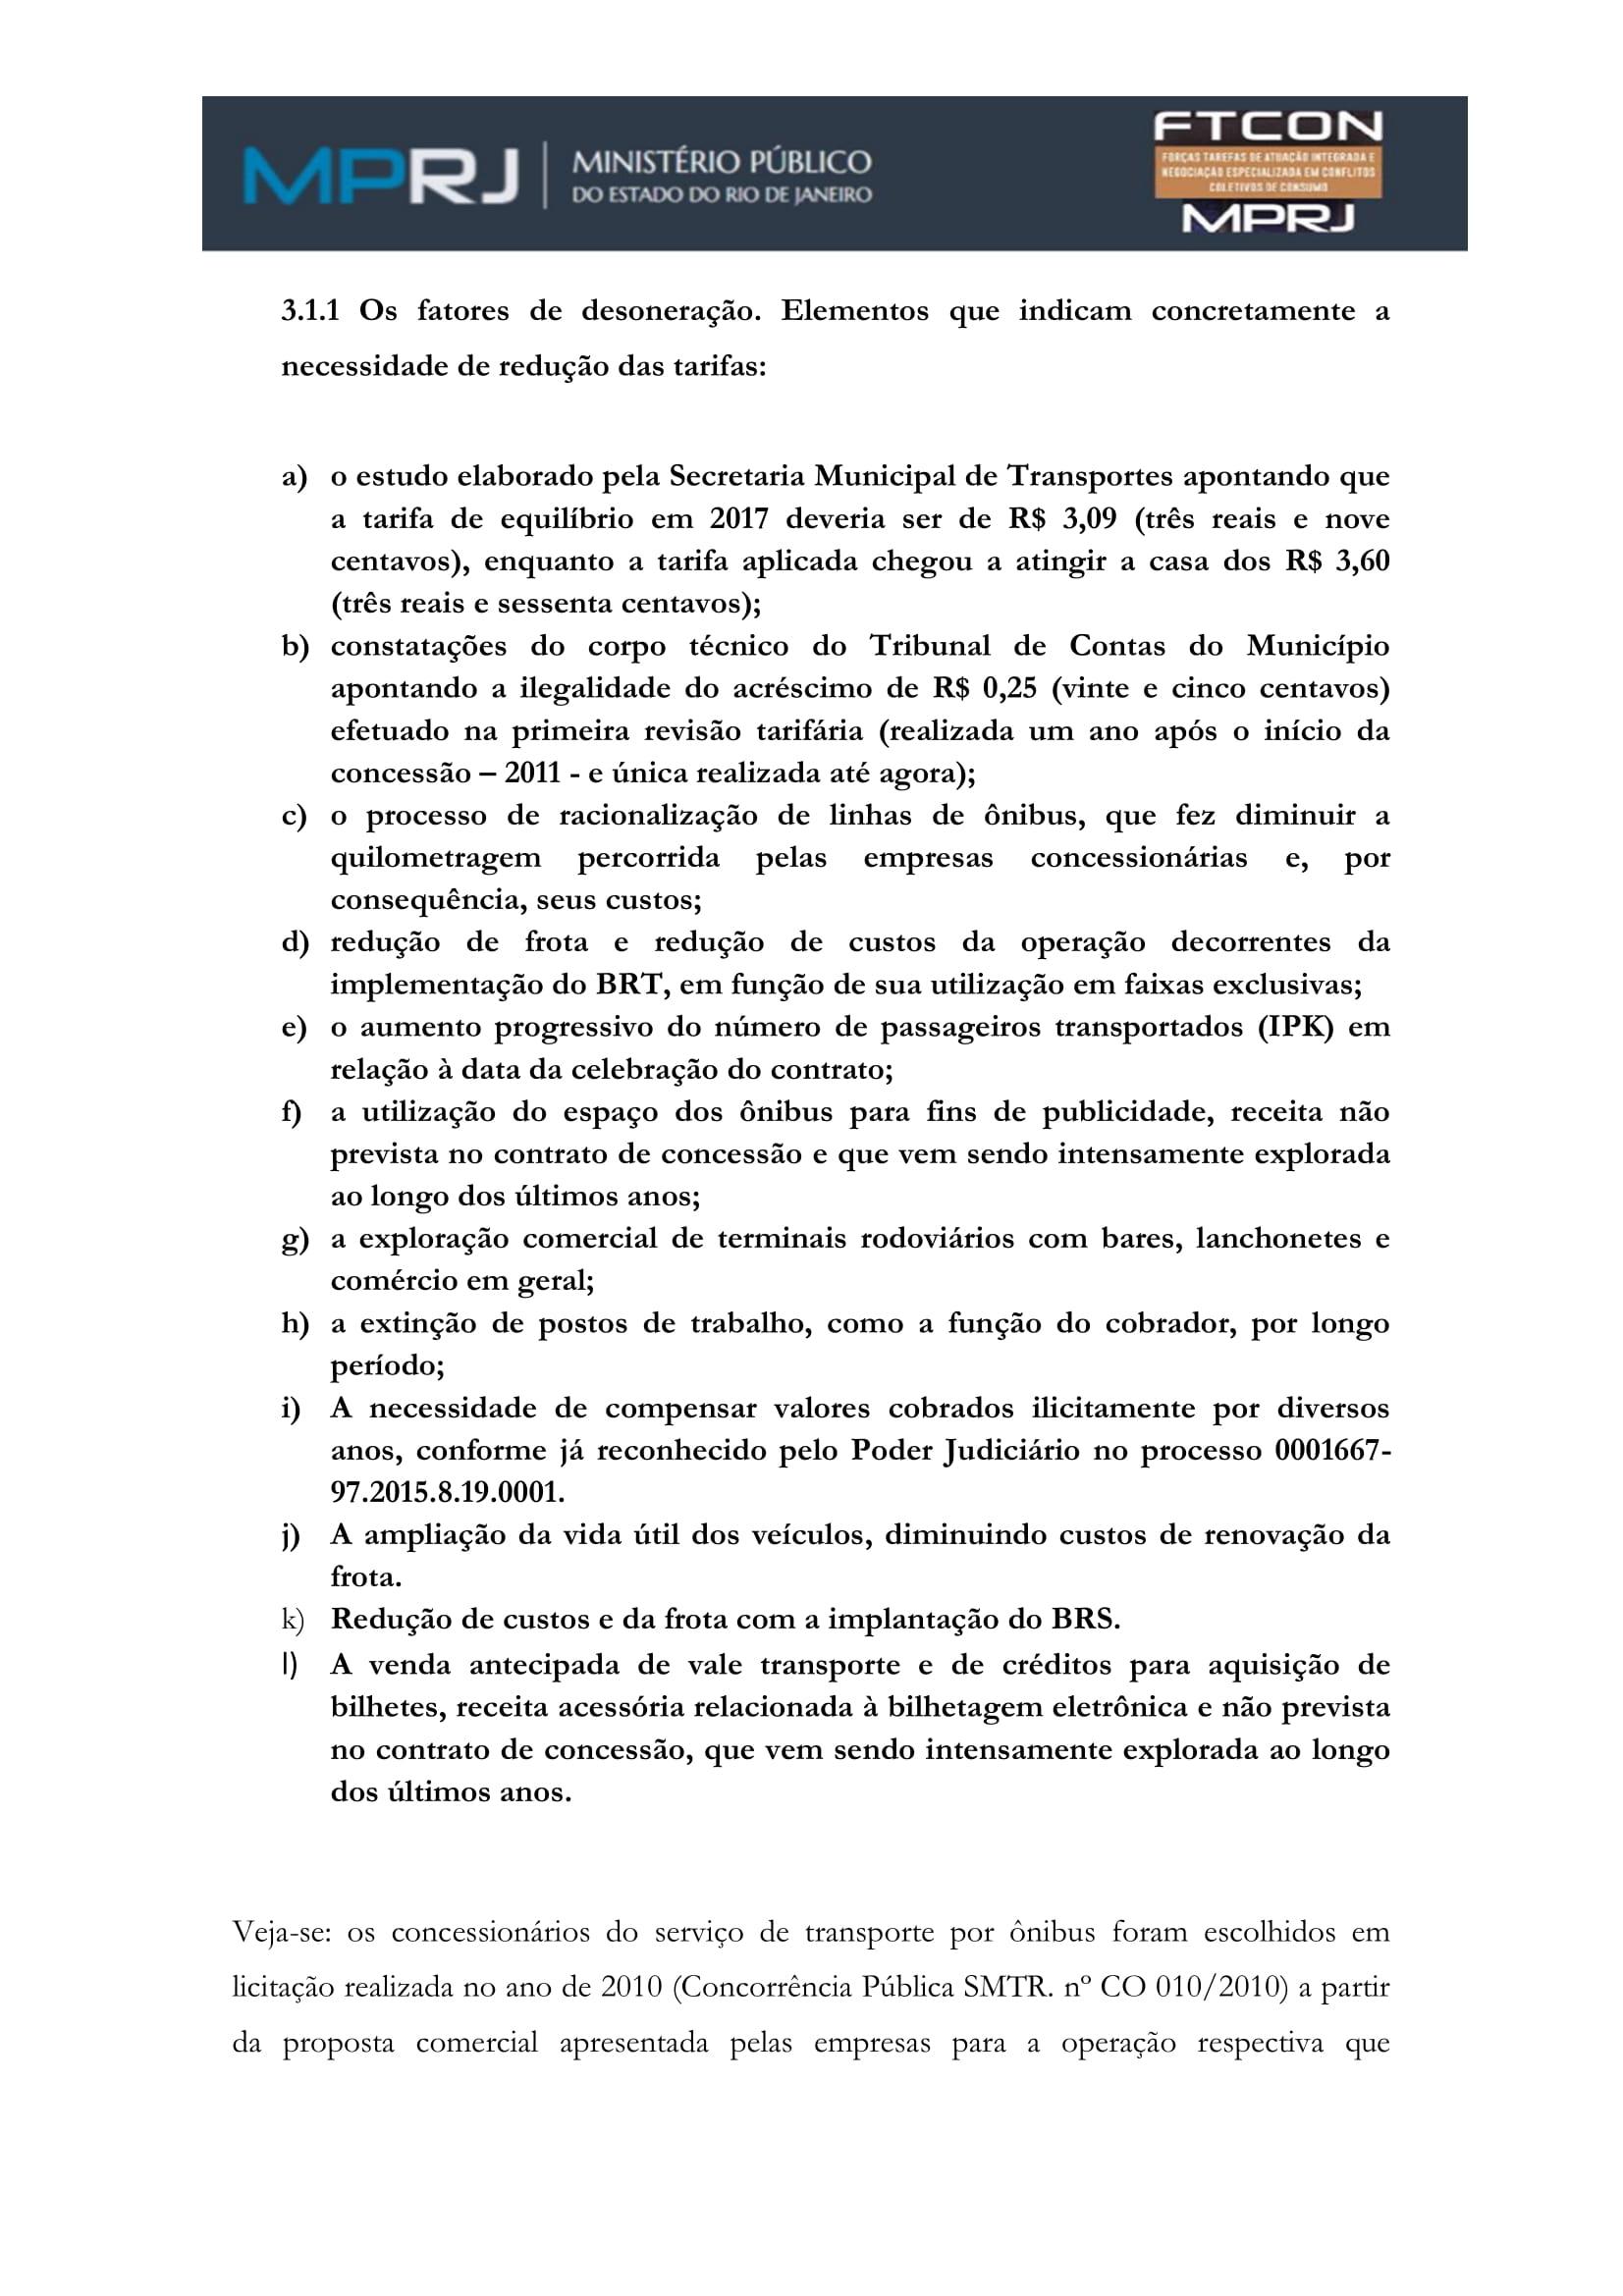 acp_caducidade_onibus_dr_rt-067